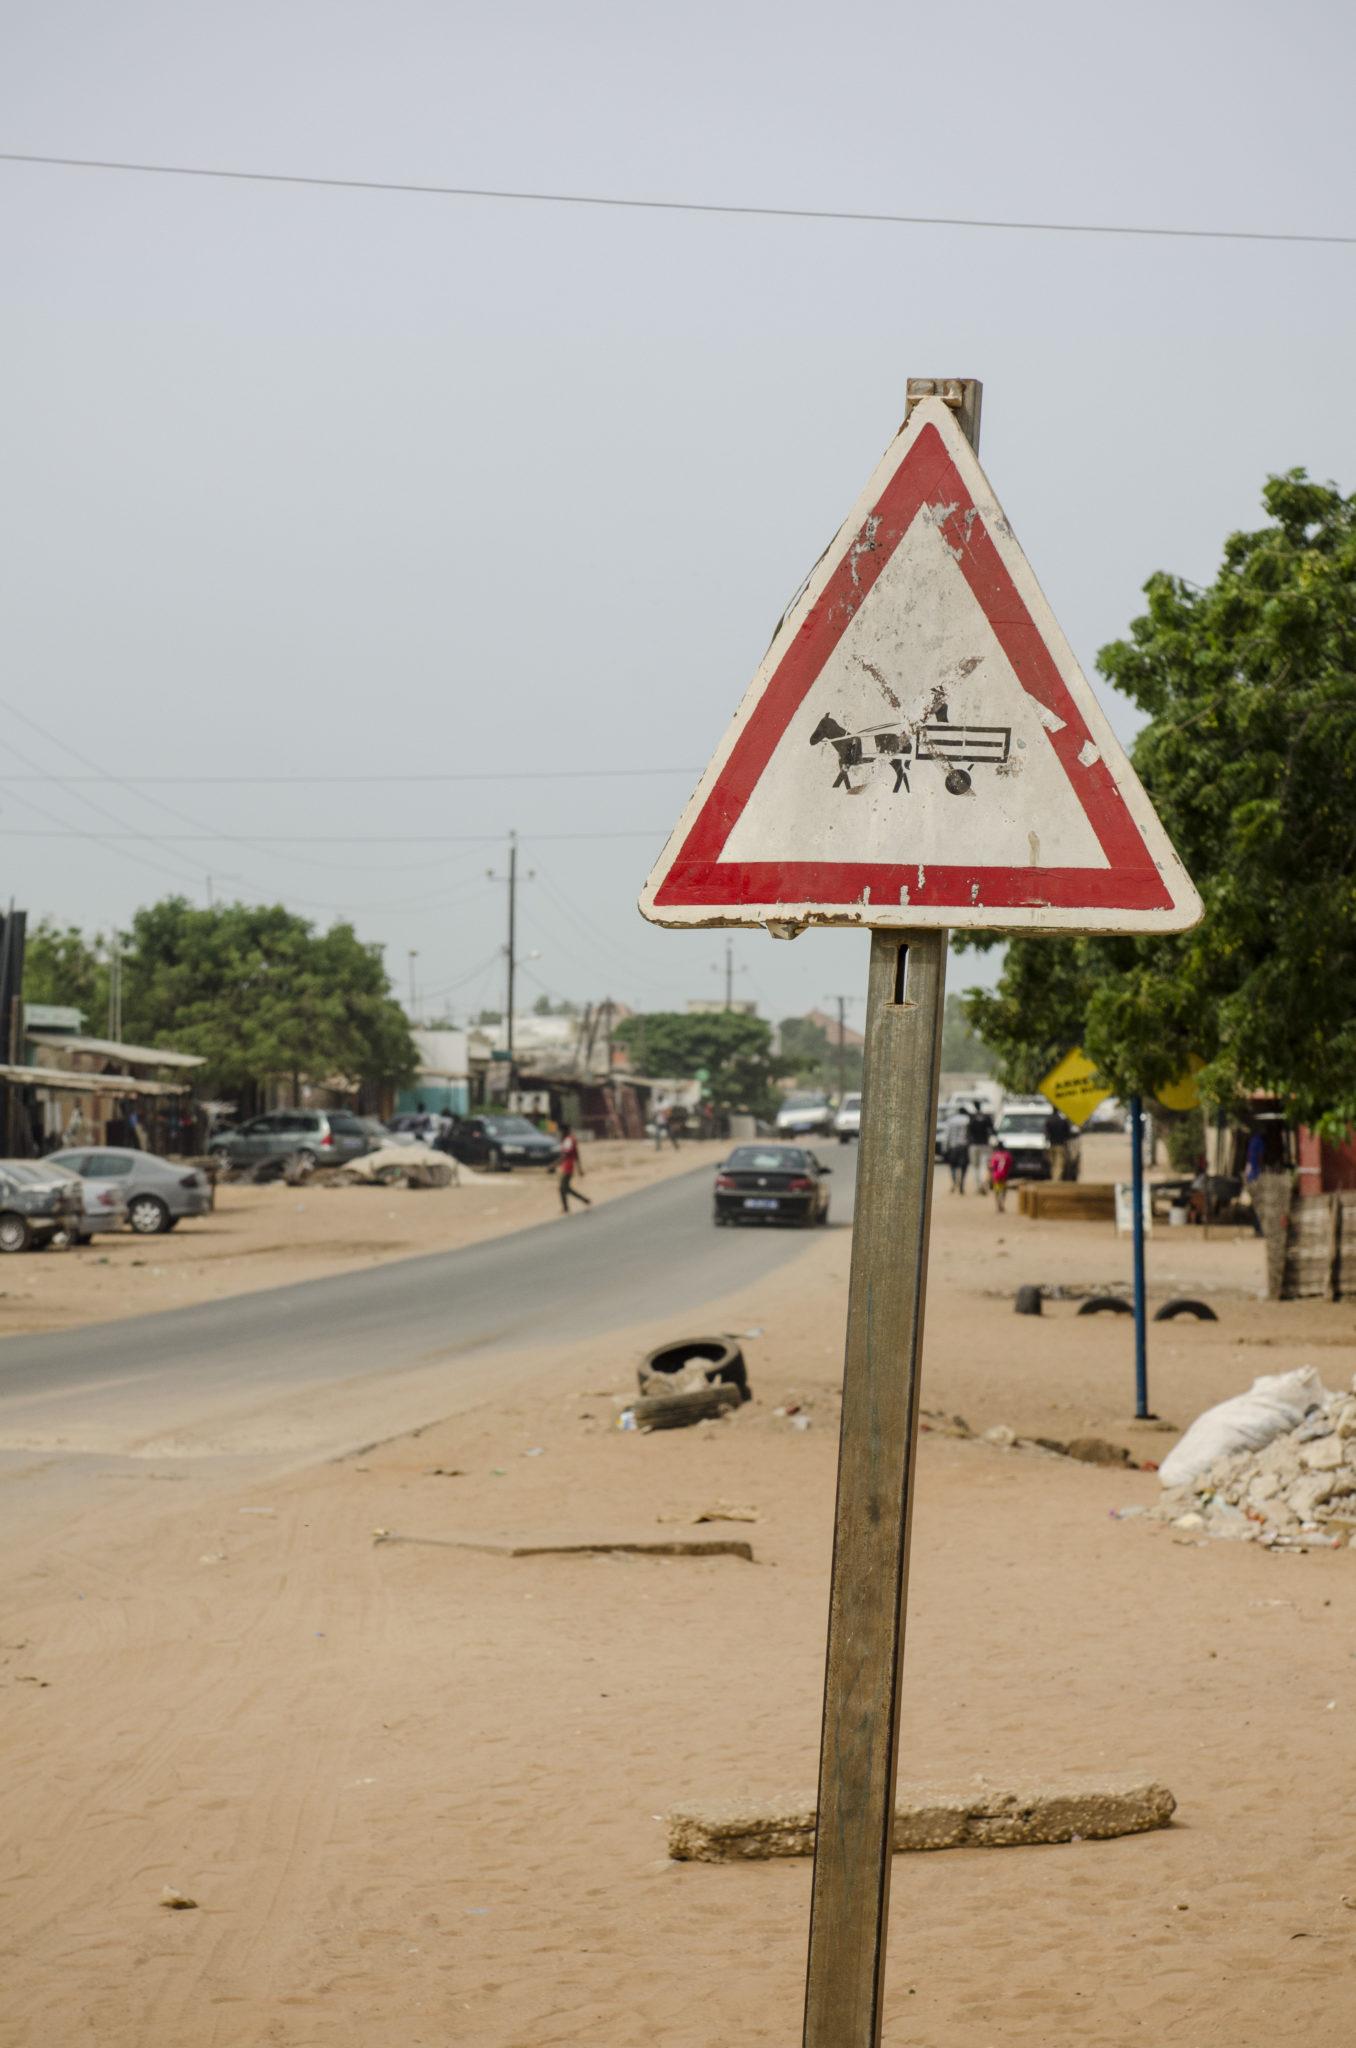 Mbour-Petite-Cote-Senegal-Kinder-Strassenschild